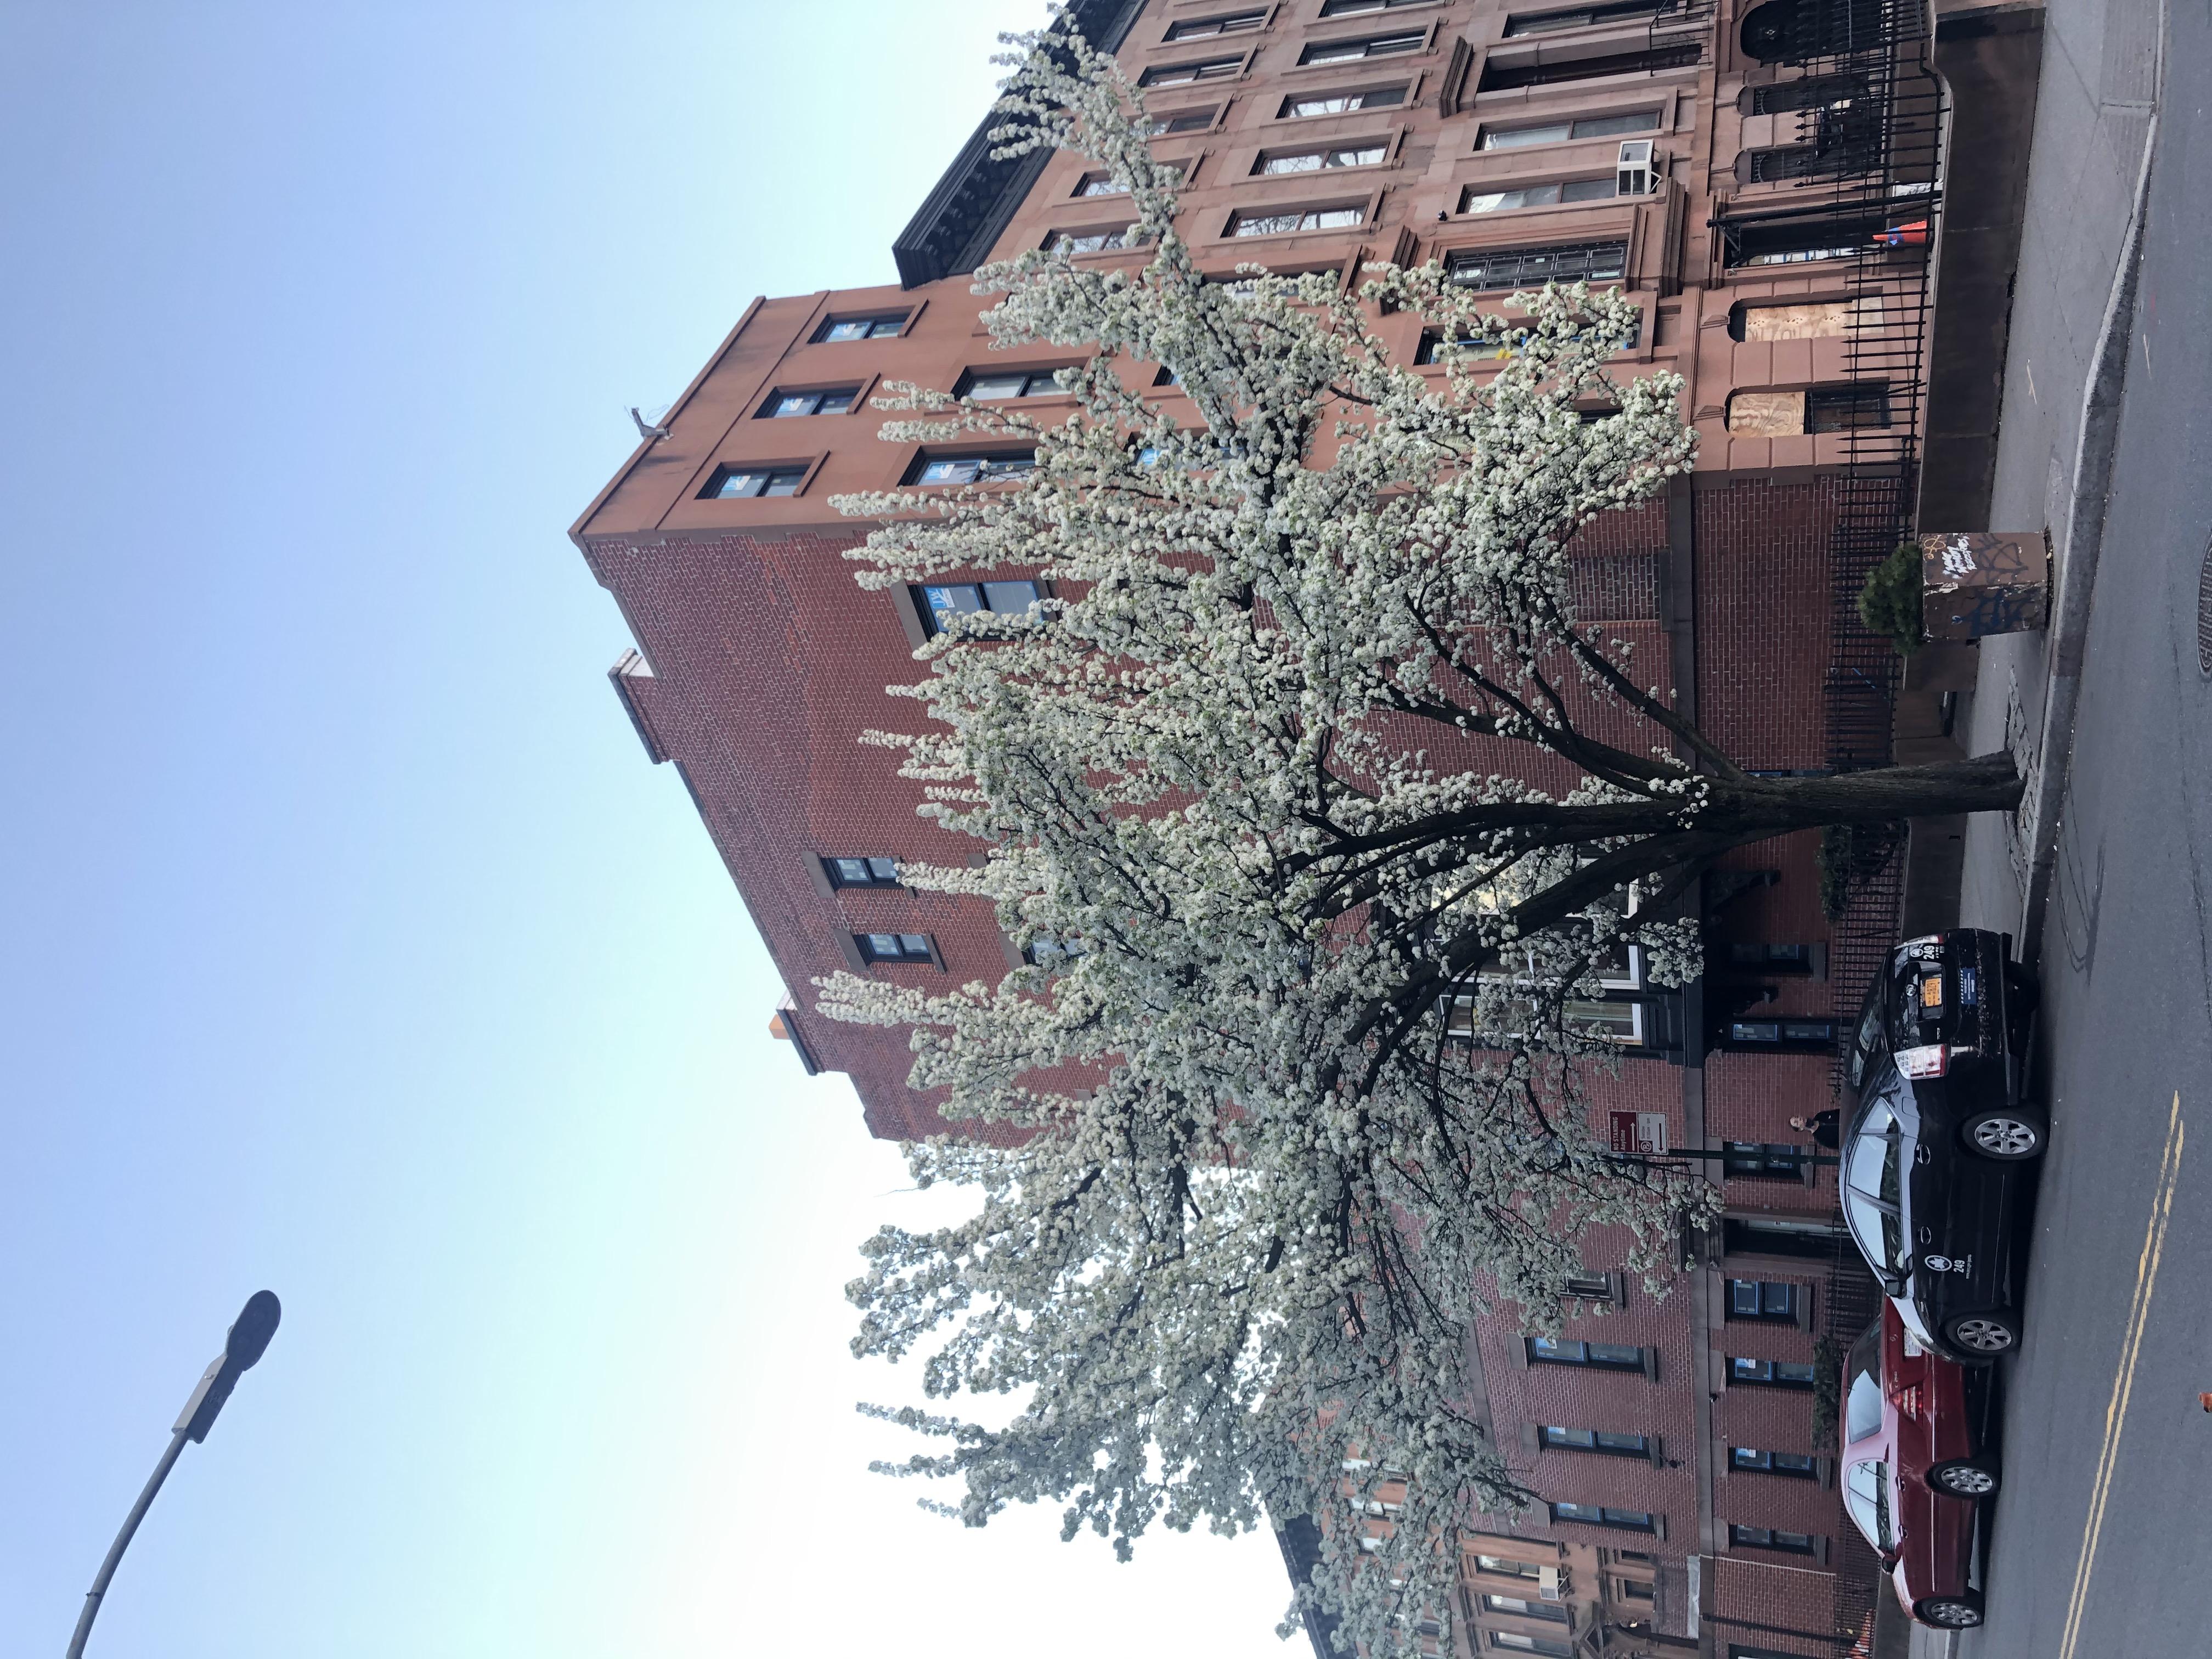 It's spring again in Brooklyn.